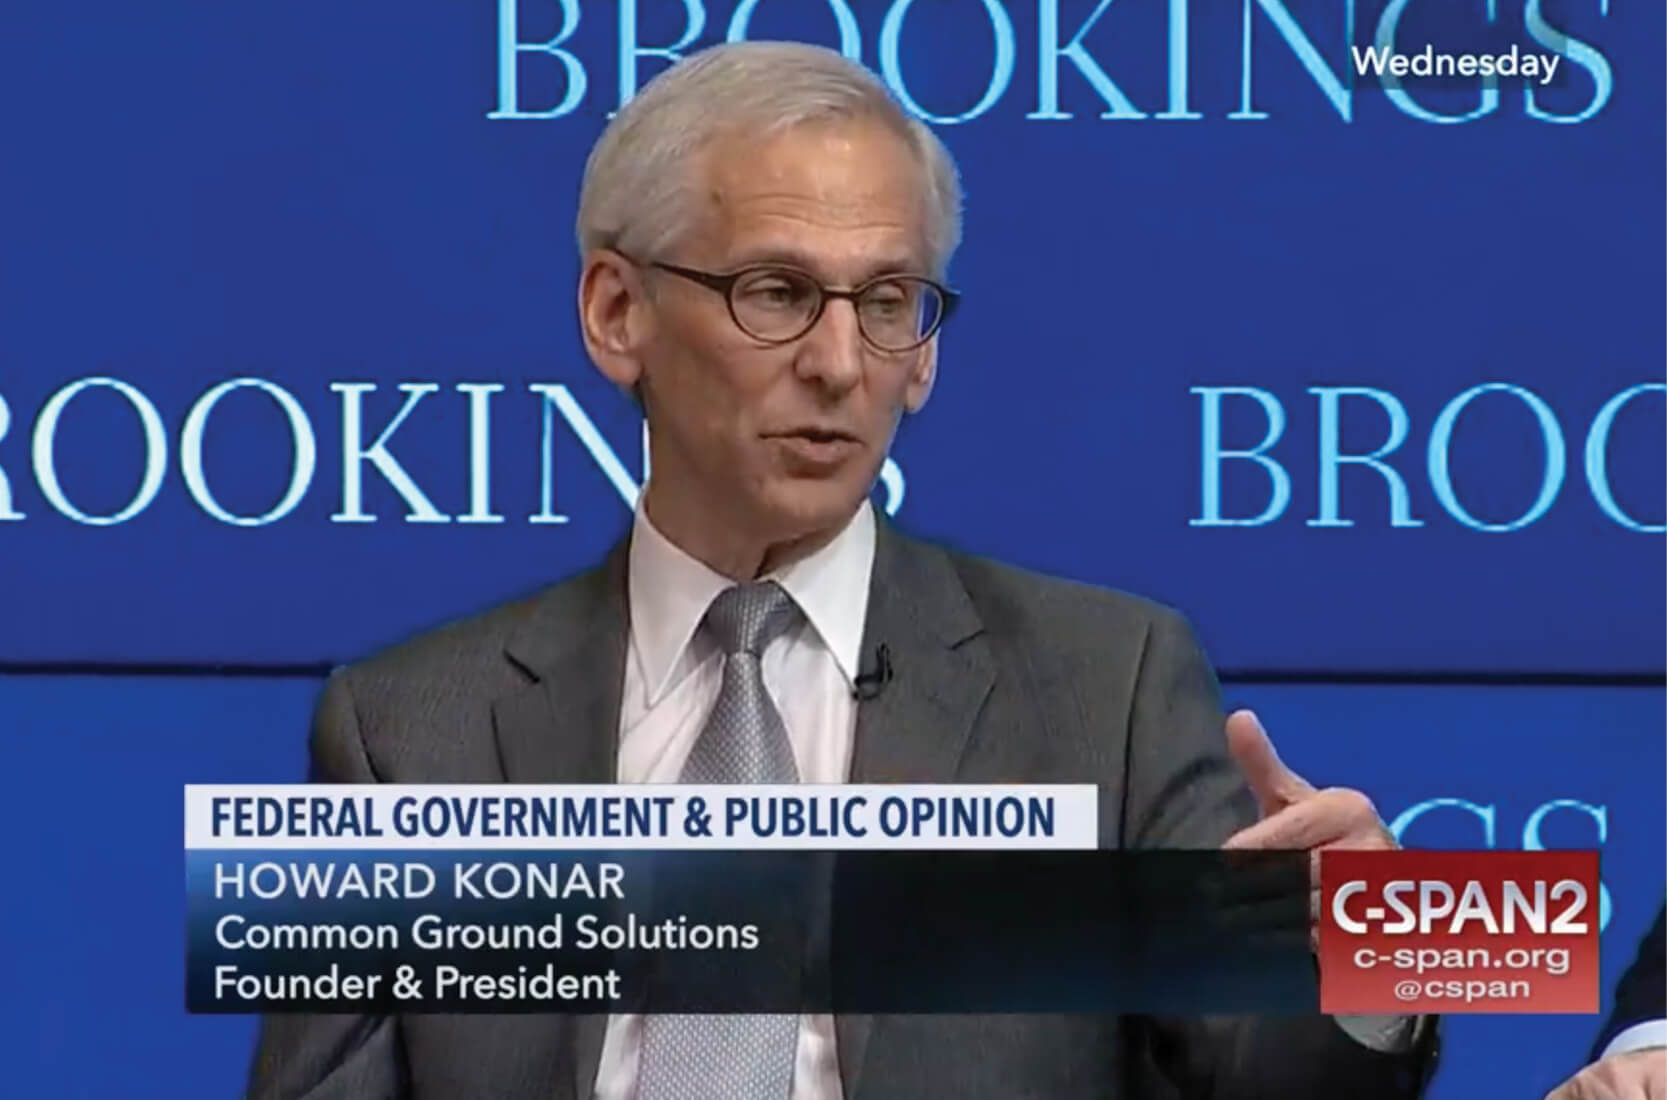 Howard Konar speaking to crowd at Brookings panel discussion